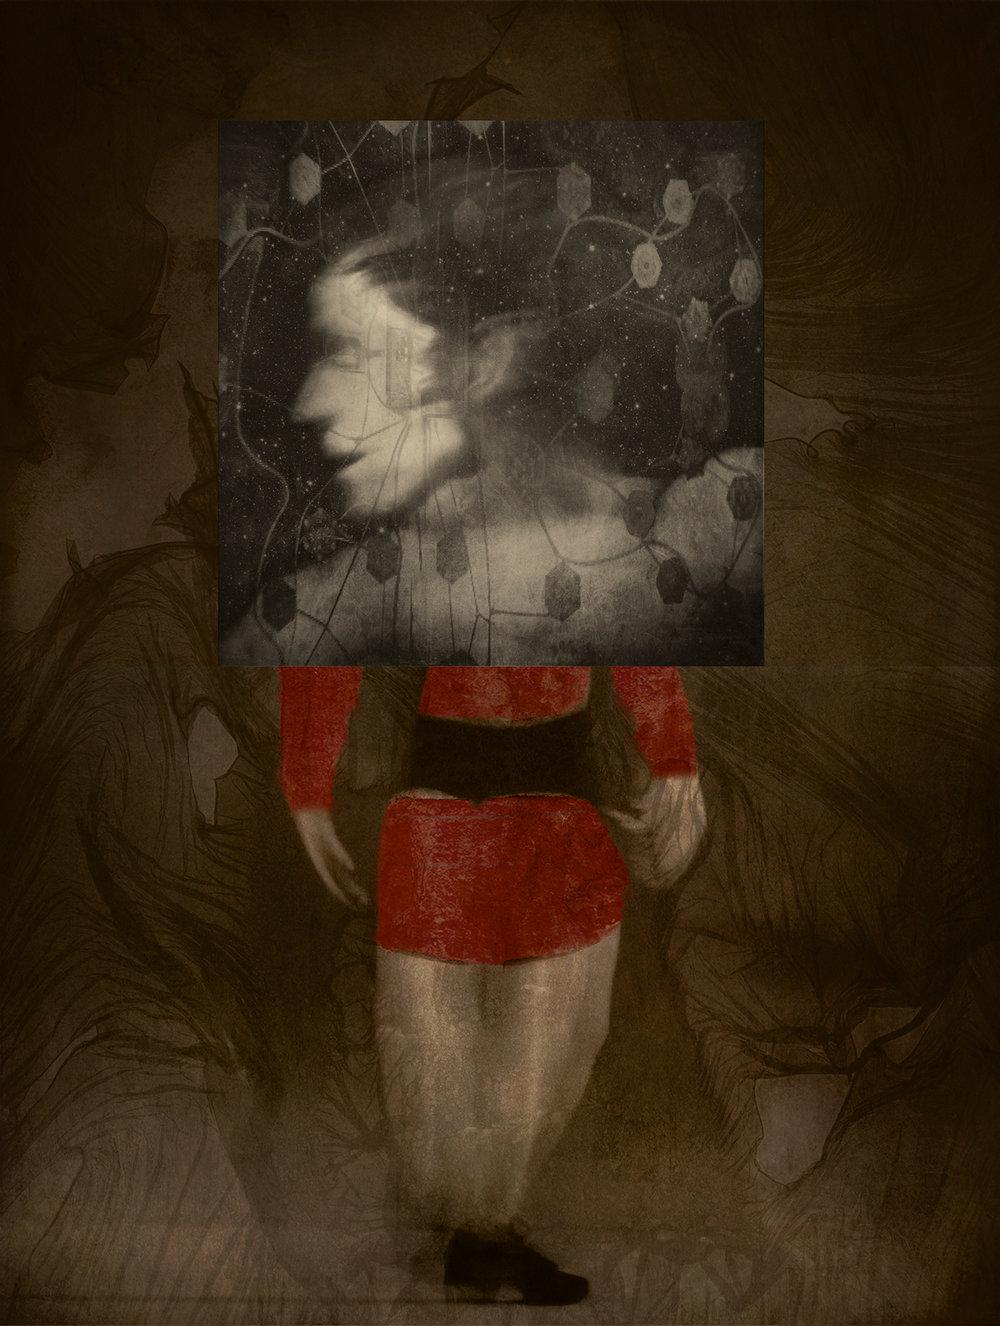 Eduardo_Fujii_Uncertain-Nature-of-Reality_Quantum-Consciousness_06.jpg